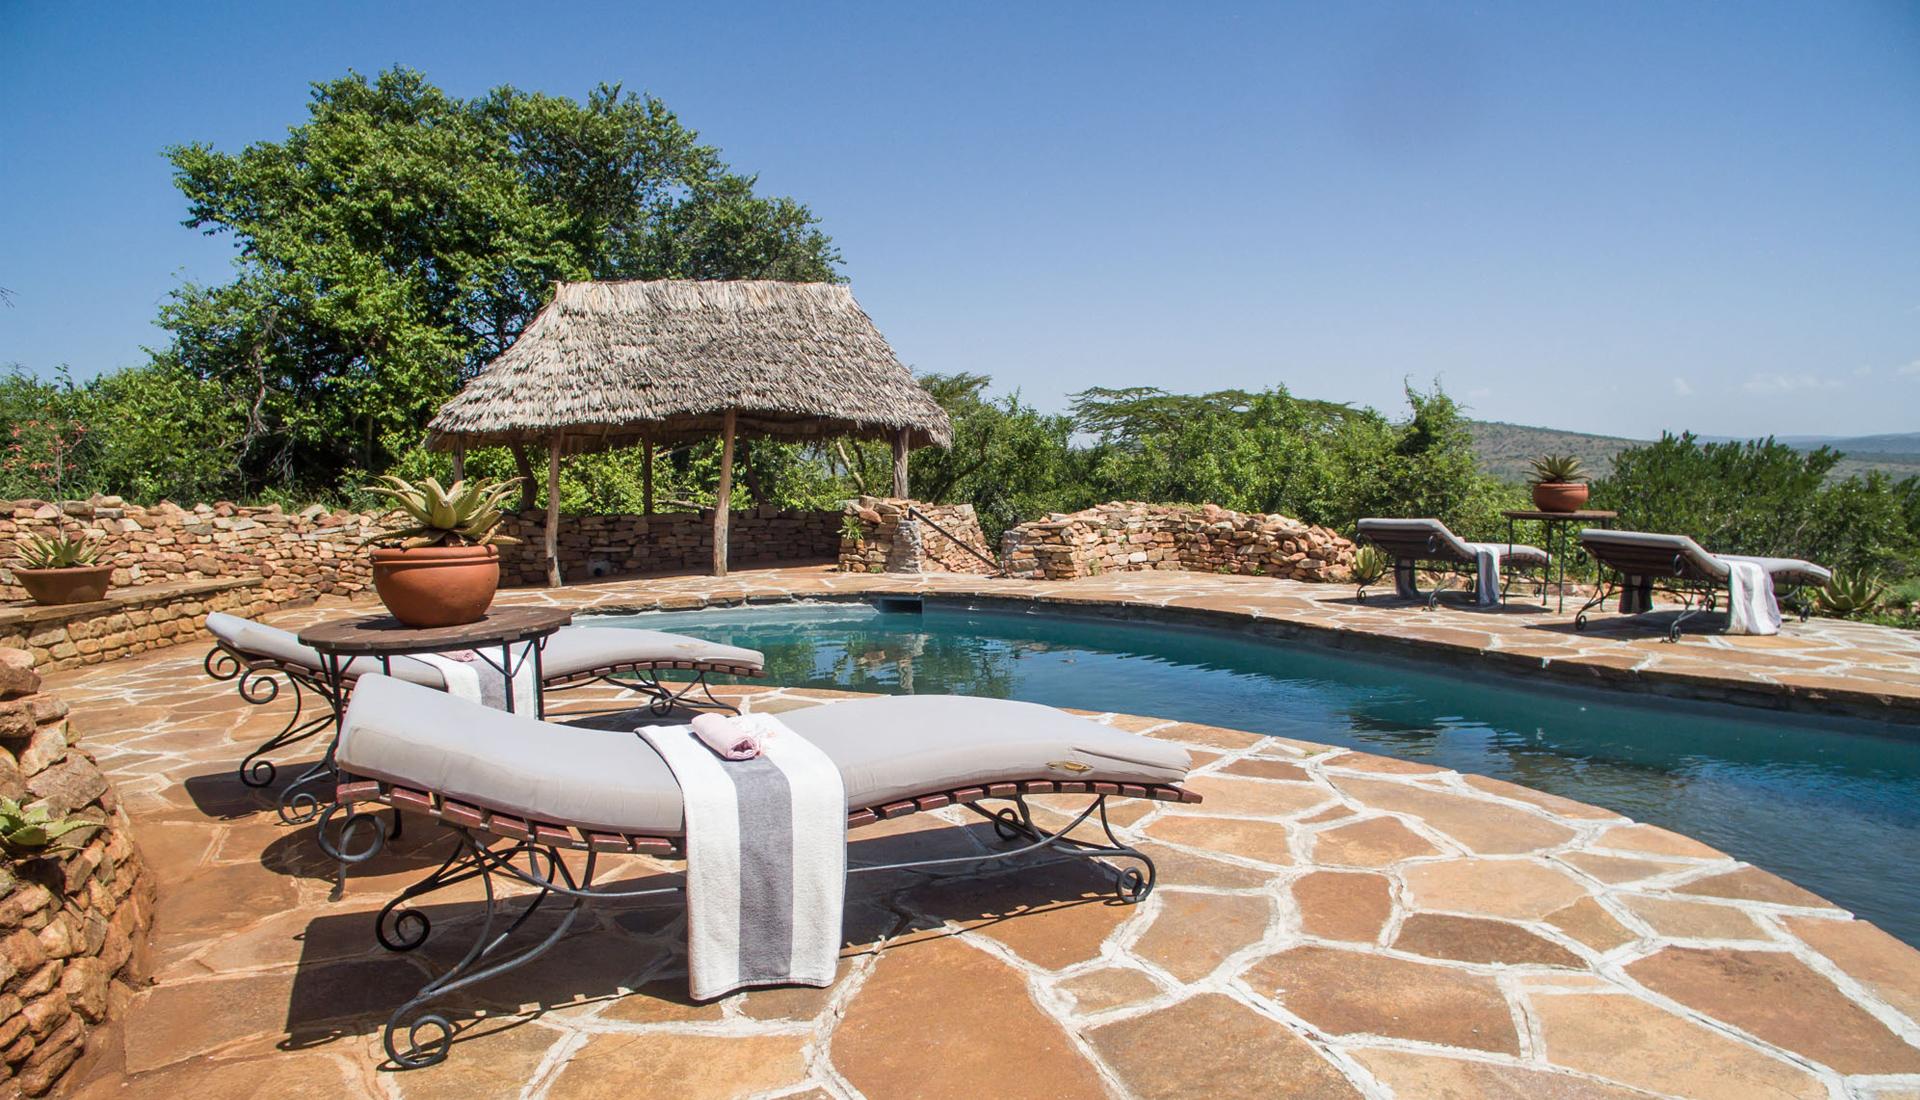 Klein s luxury camp north serengeti gofan safaris and travel africa ltd - Swimmingpool klein ...